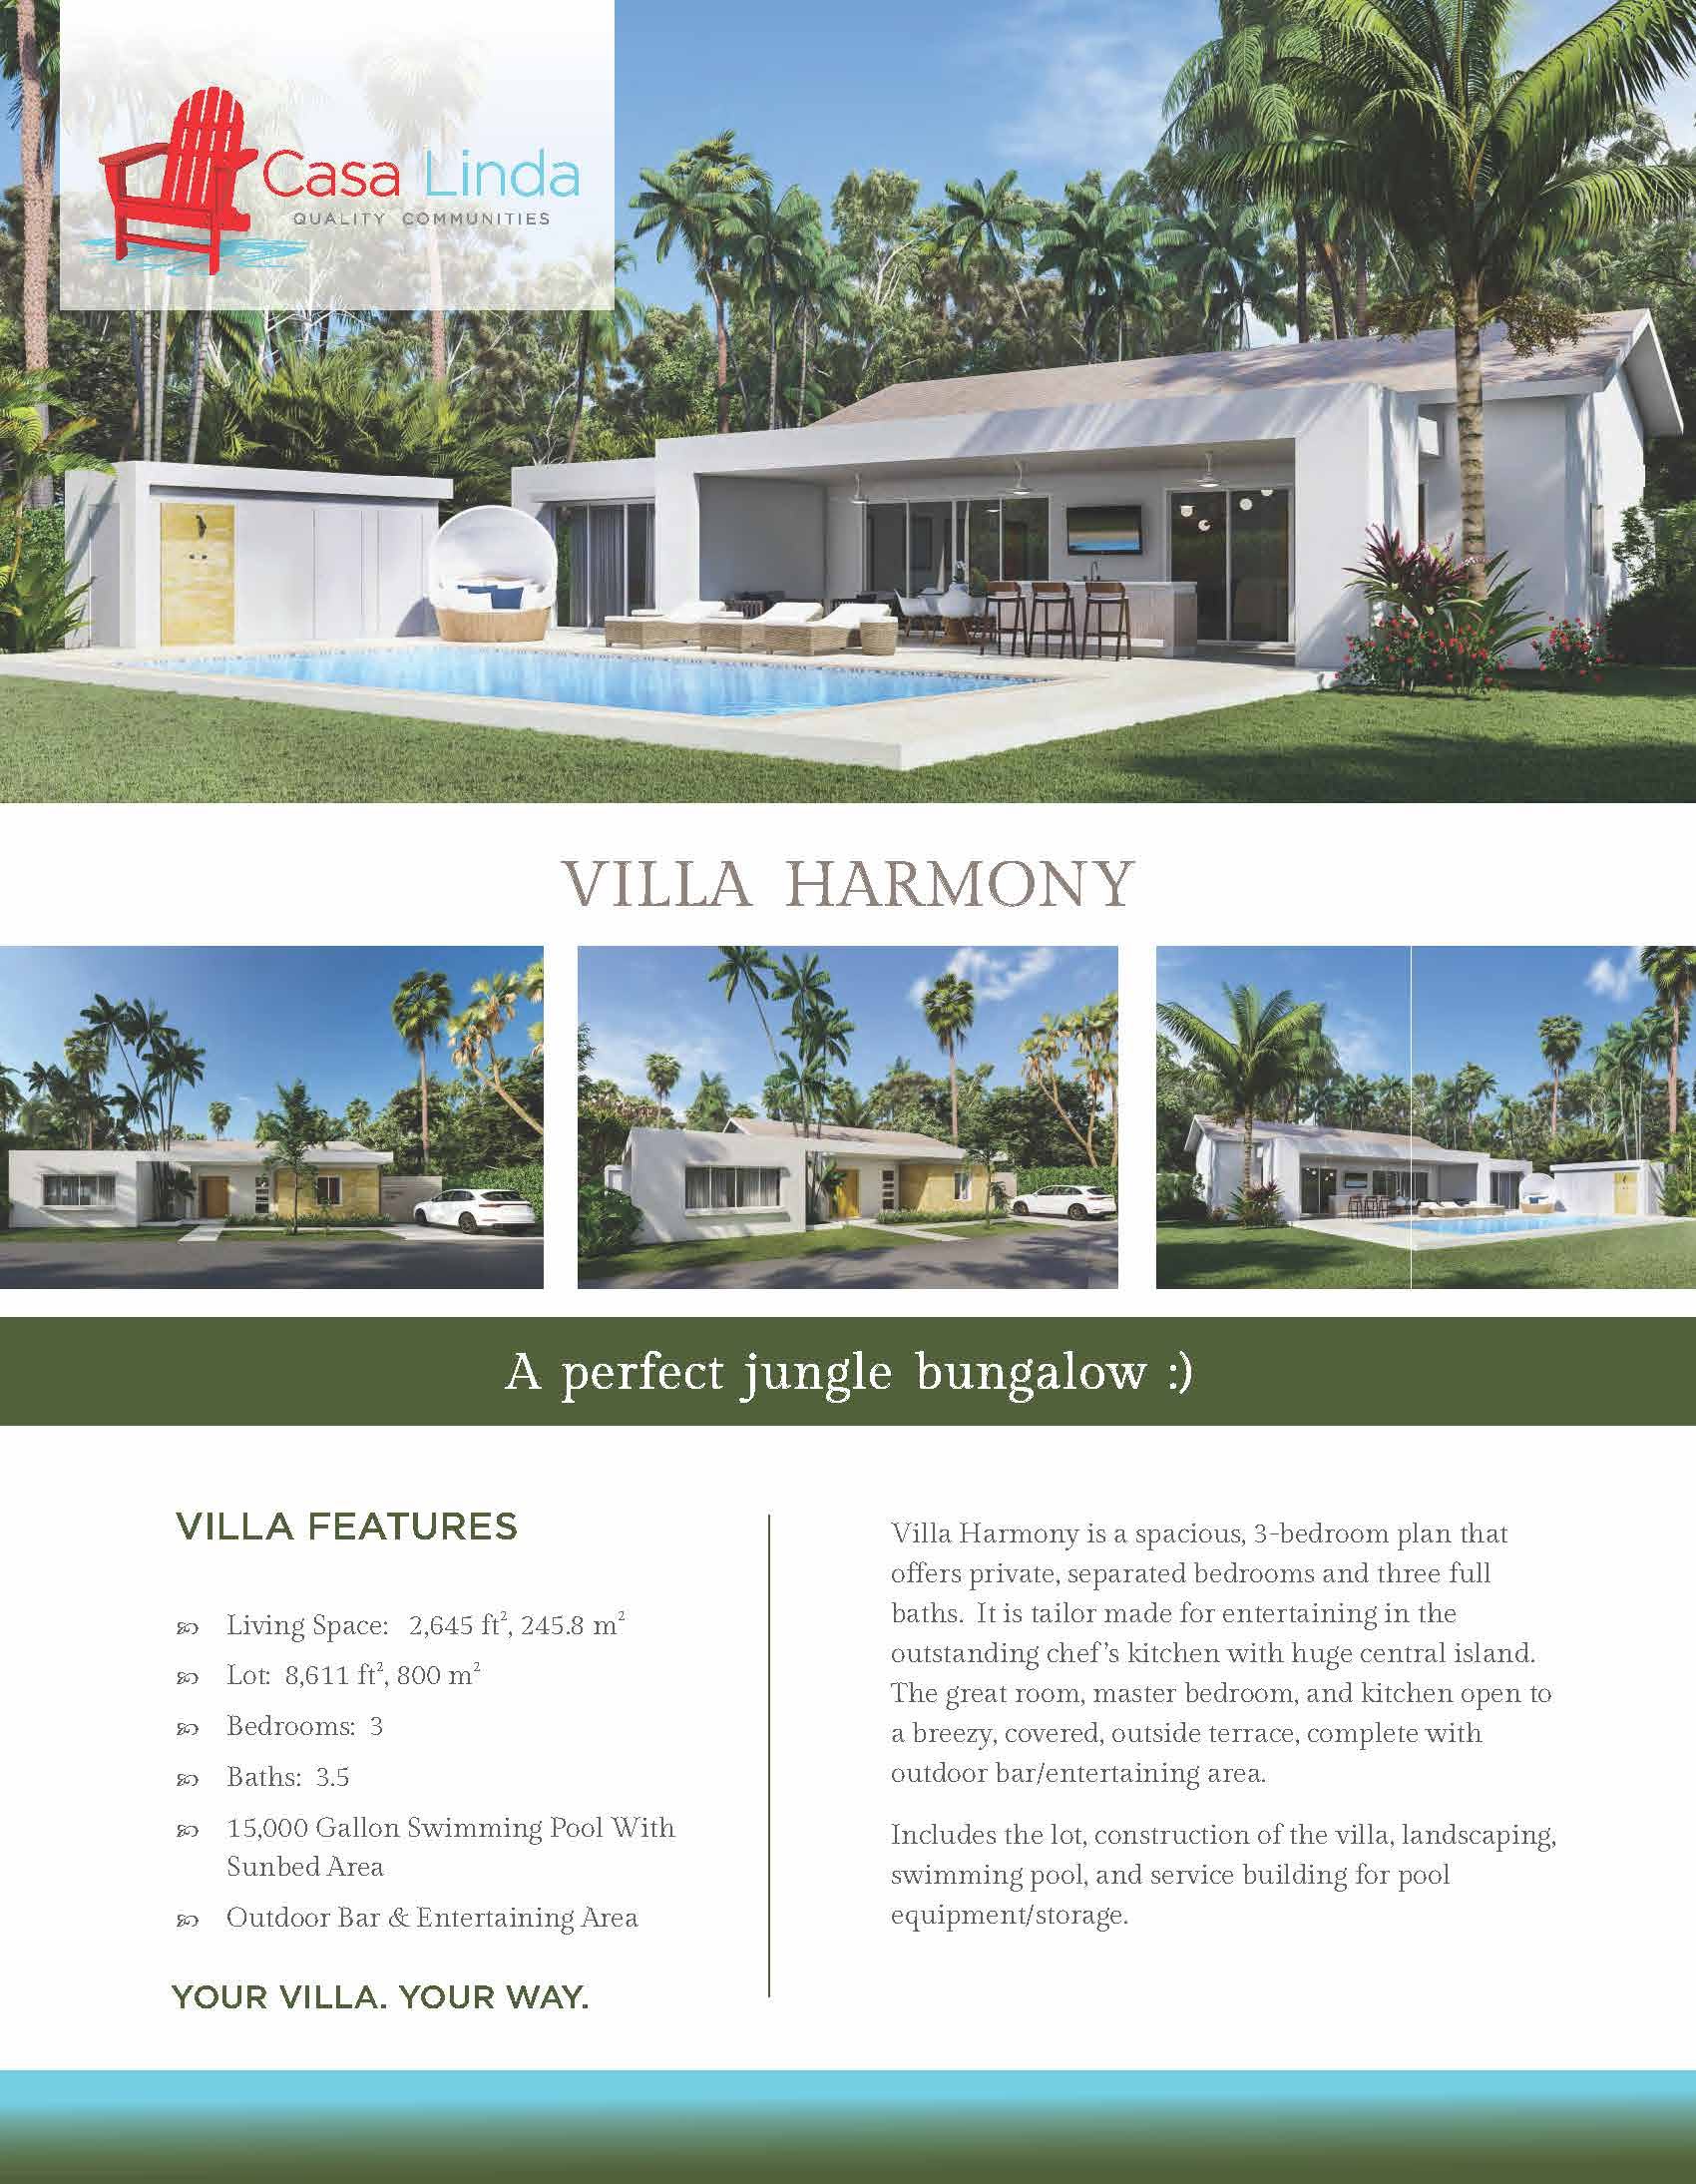 Villa Harmony Casa Linda Villas